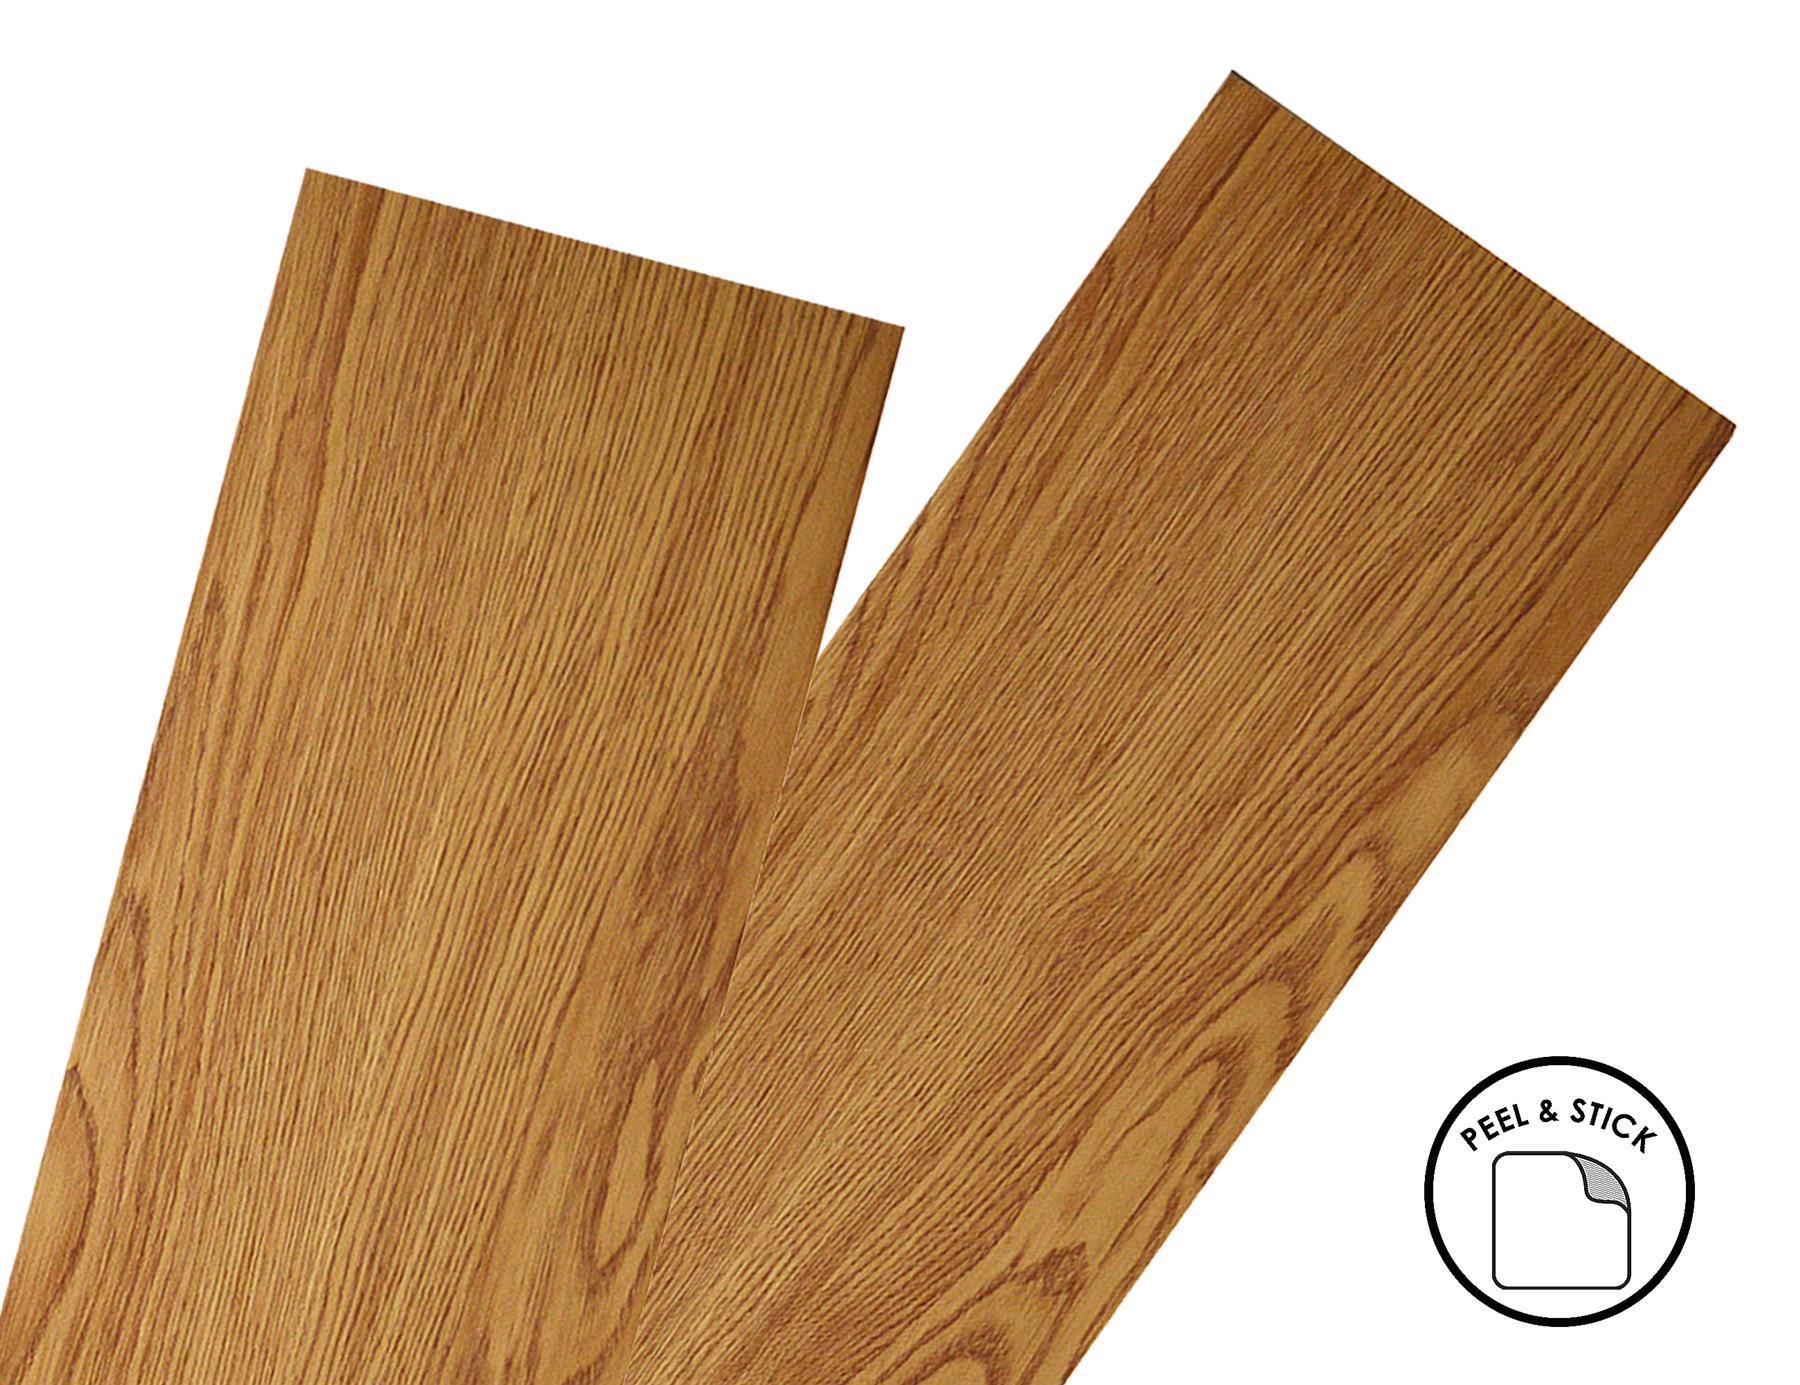 thumbnail 13 - Floor Planks Tiles Self Adhesive Vinyl Brown Wood Flooring Kitchen Bathroom